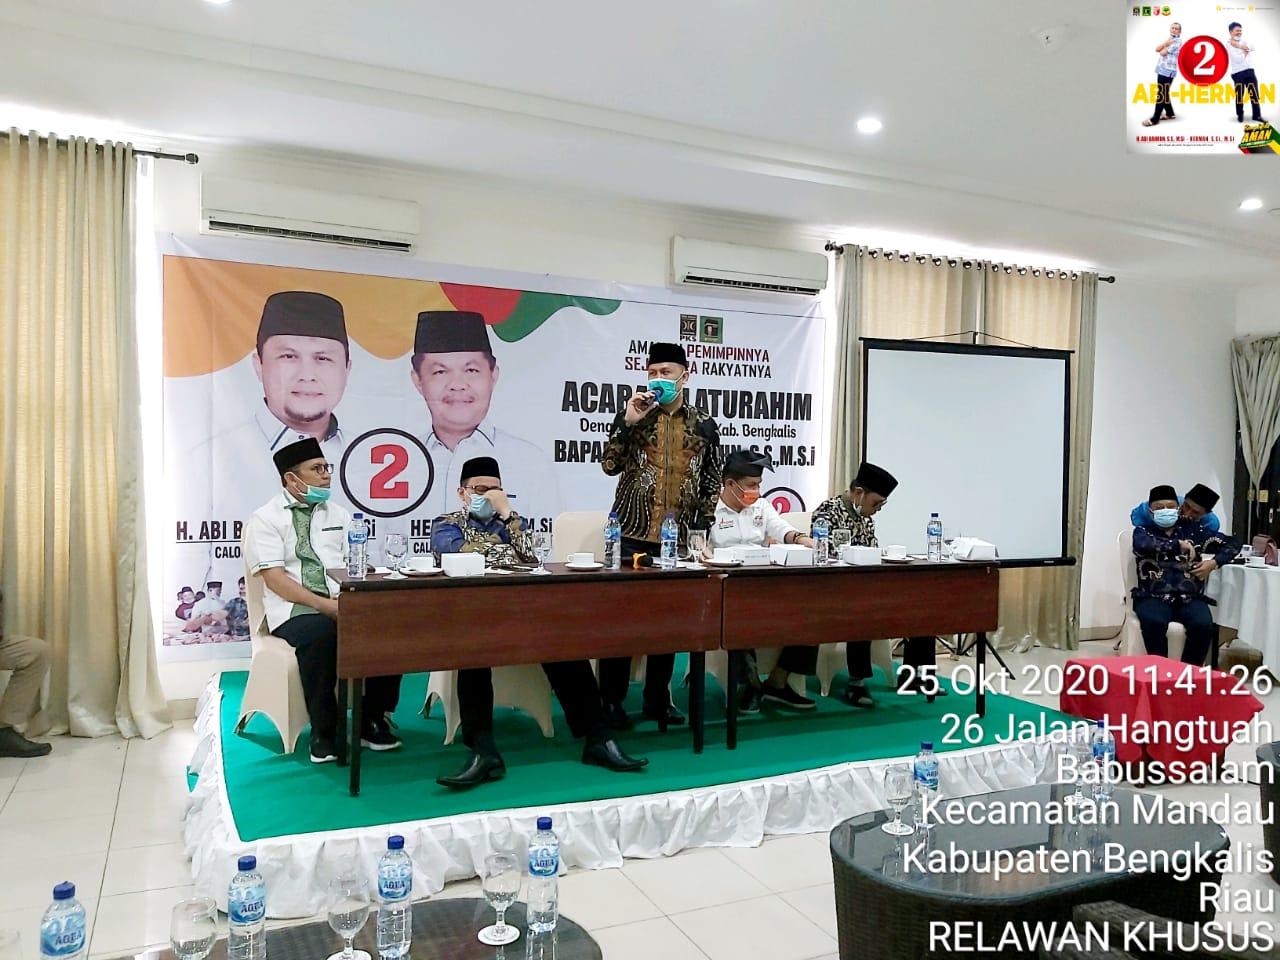 Buya Hamka Riau Serukan, Jadikan Abi Bahrun - Herman Bupati Bengkalis